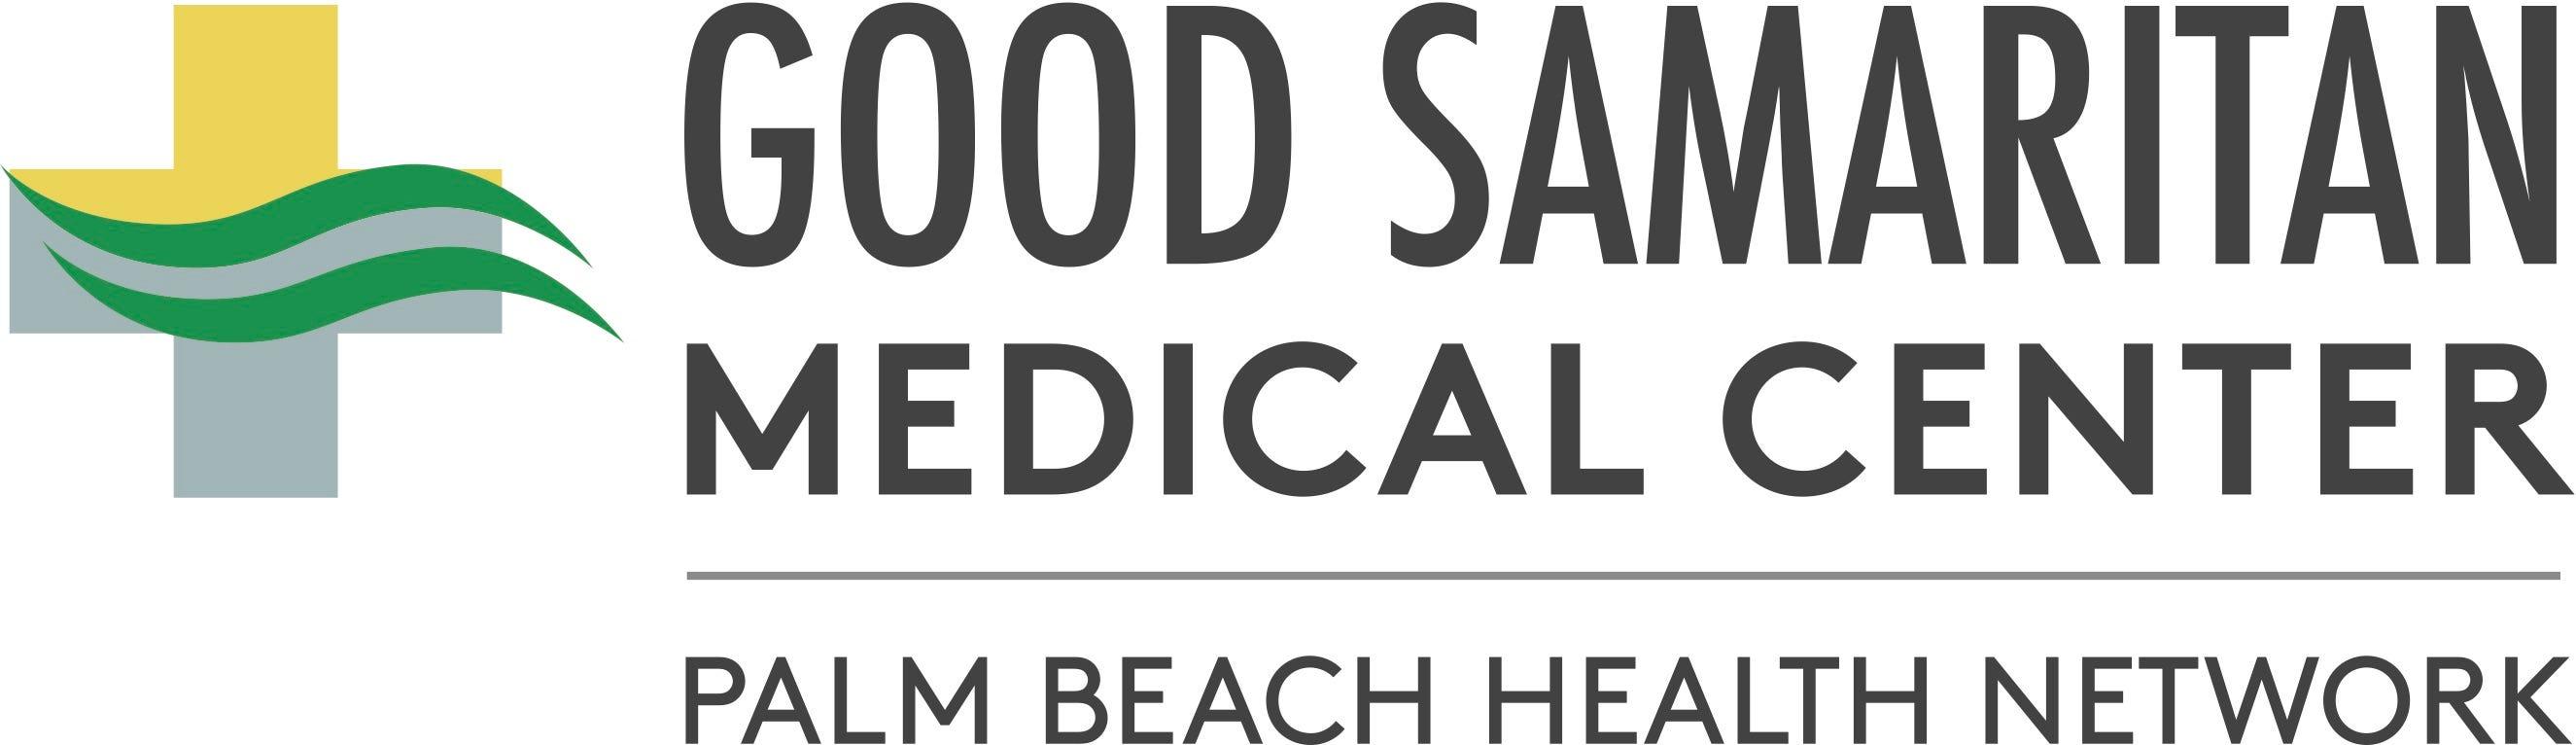 Good Samaritan Medical Center West Palm Beach Logo